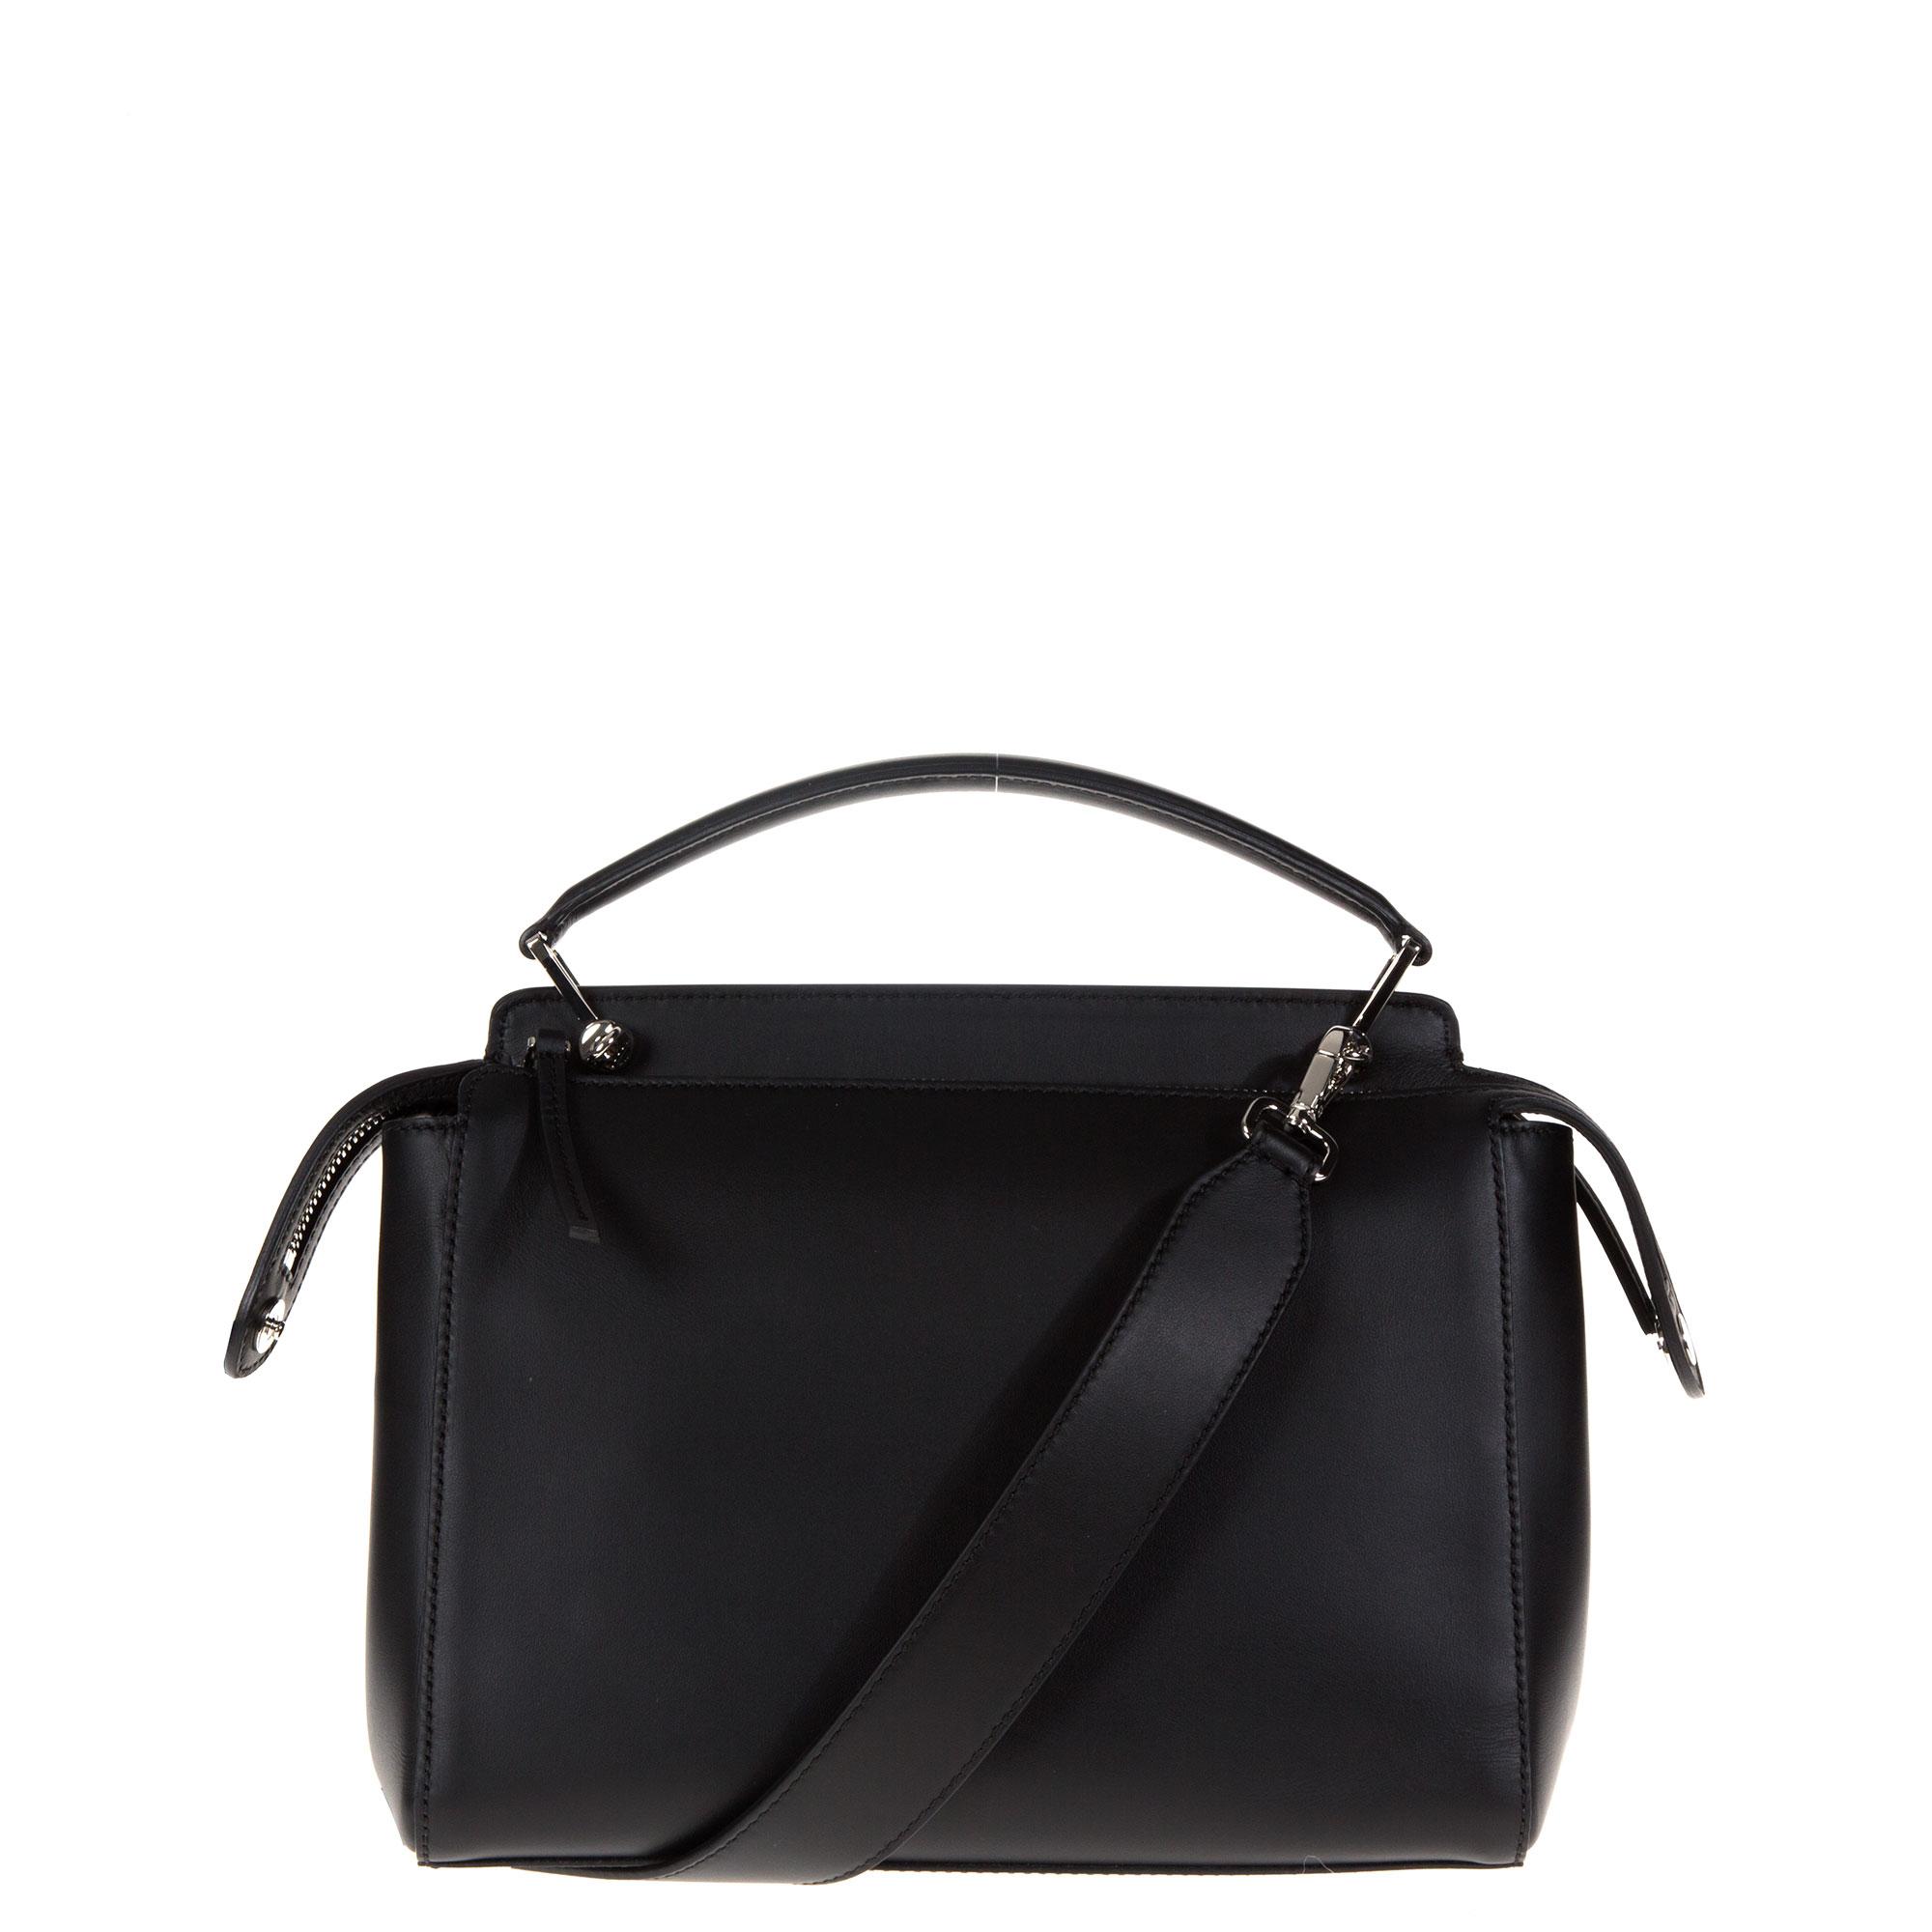 5c2ac24474b2 fendi dotcom two-tone leather satchel